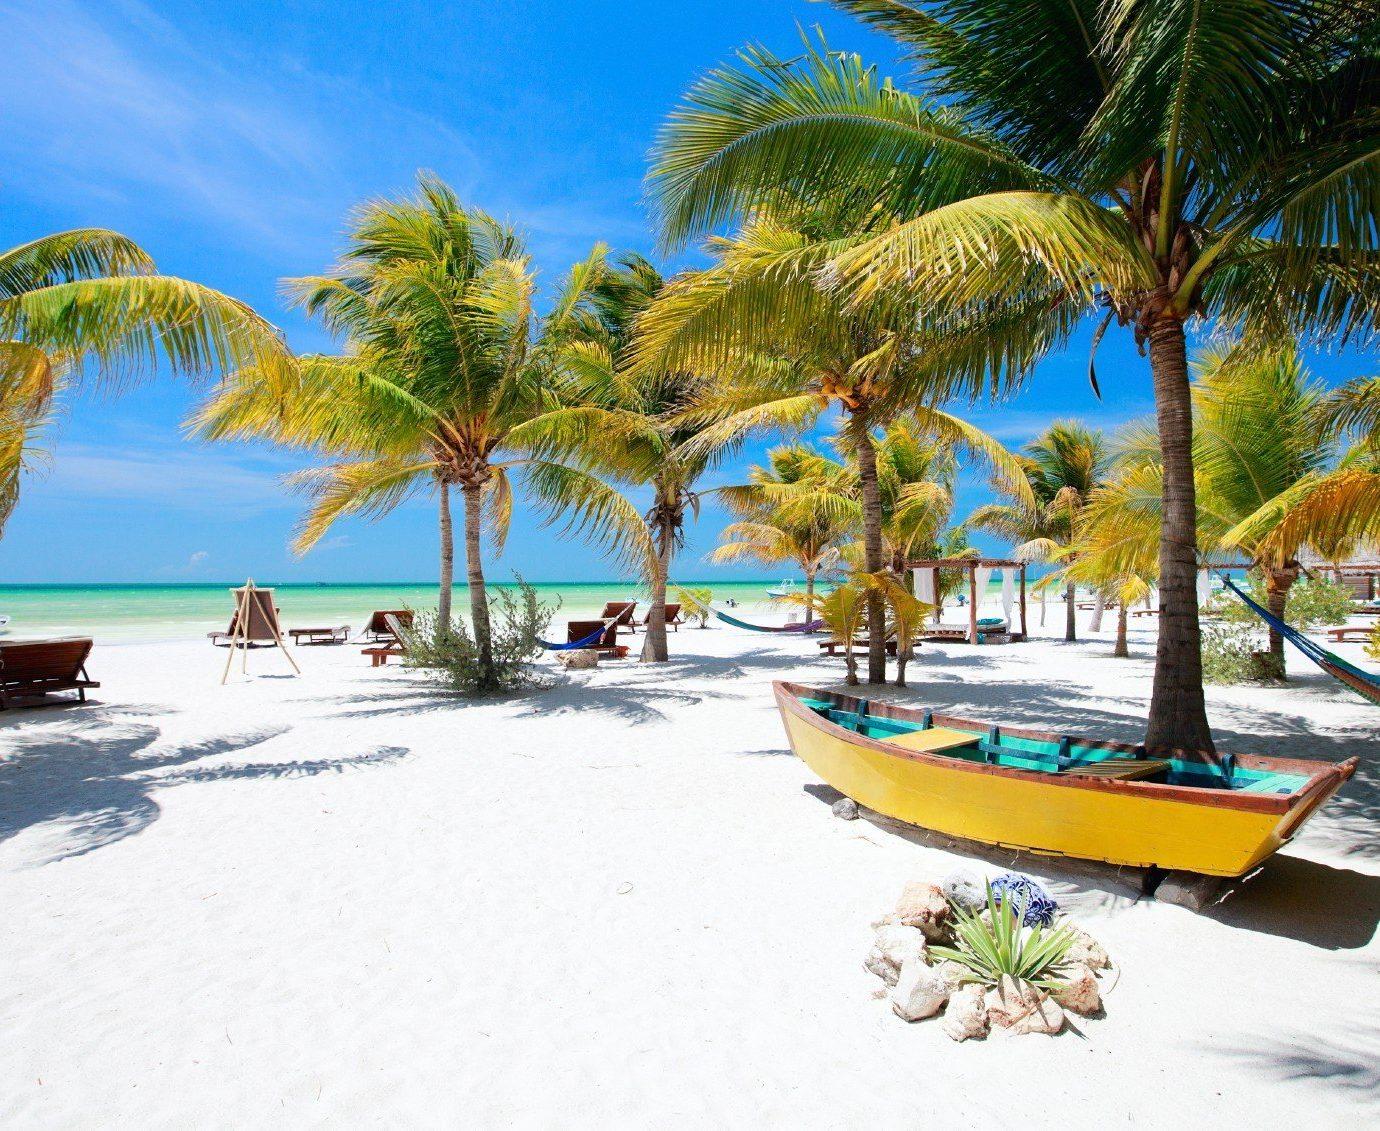 Secret Getaways Trip Ideas tree outdoor water palm Beach Resort leisure caribbean vacation arecales Pool Sea Lagoon bay tropics Island plant shore lined sandy